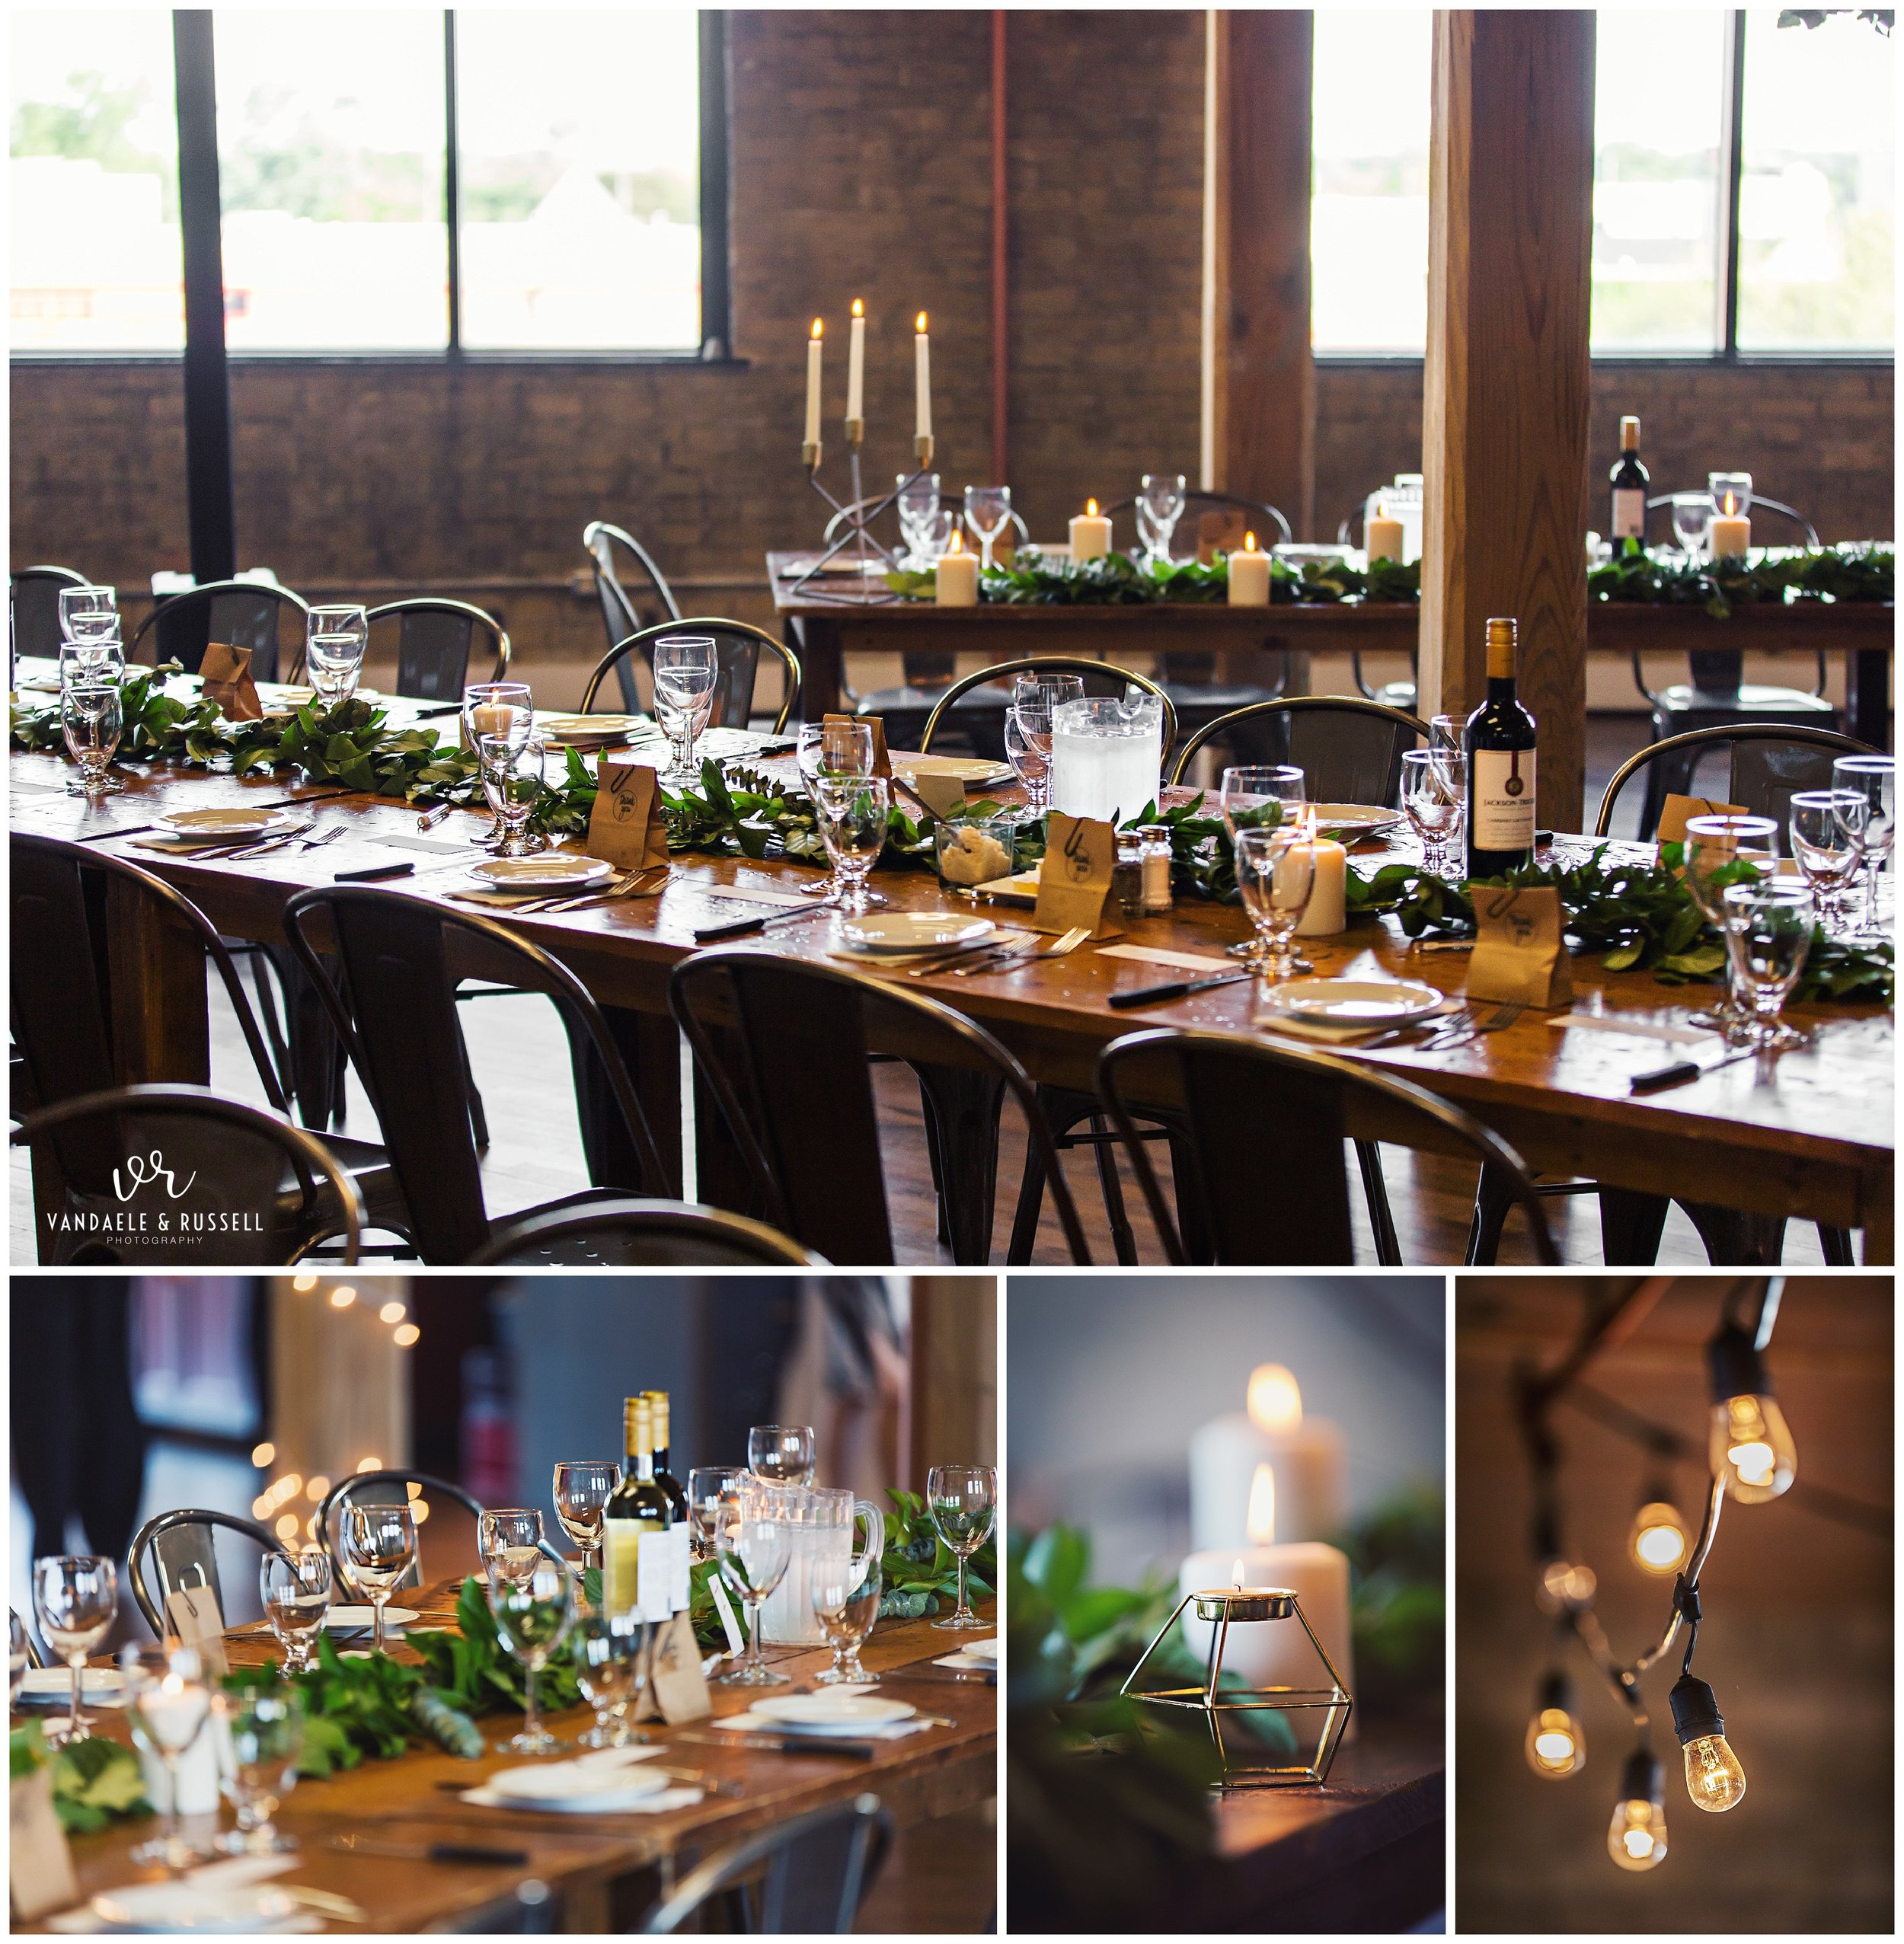 VanDaele-Russell-Wedding-Photography-London-Toronto-Ontario_0121.jpg